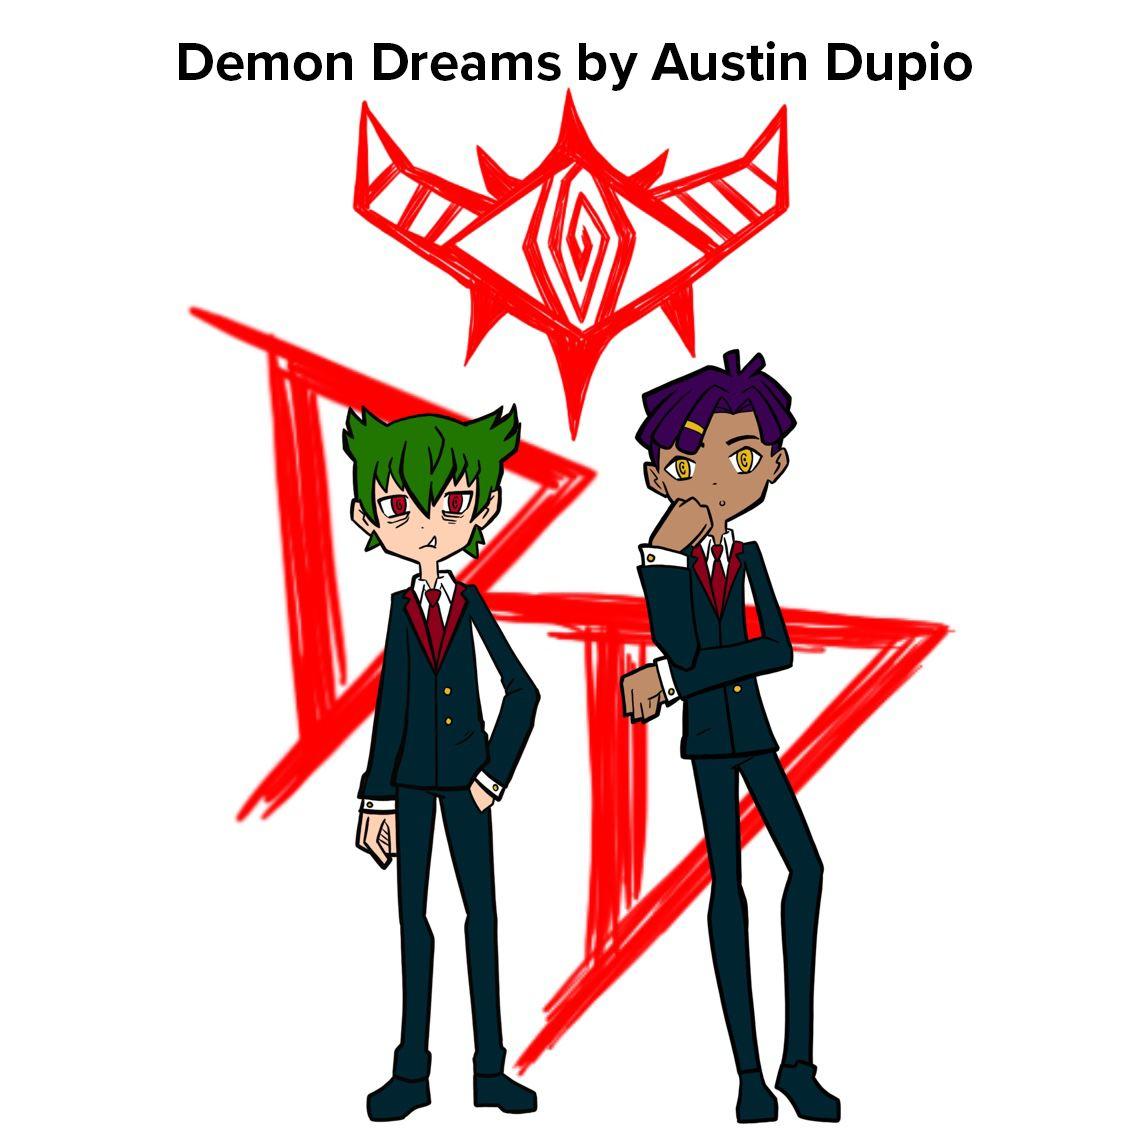 Demon Dreams by Austin Dupio